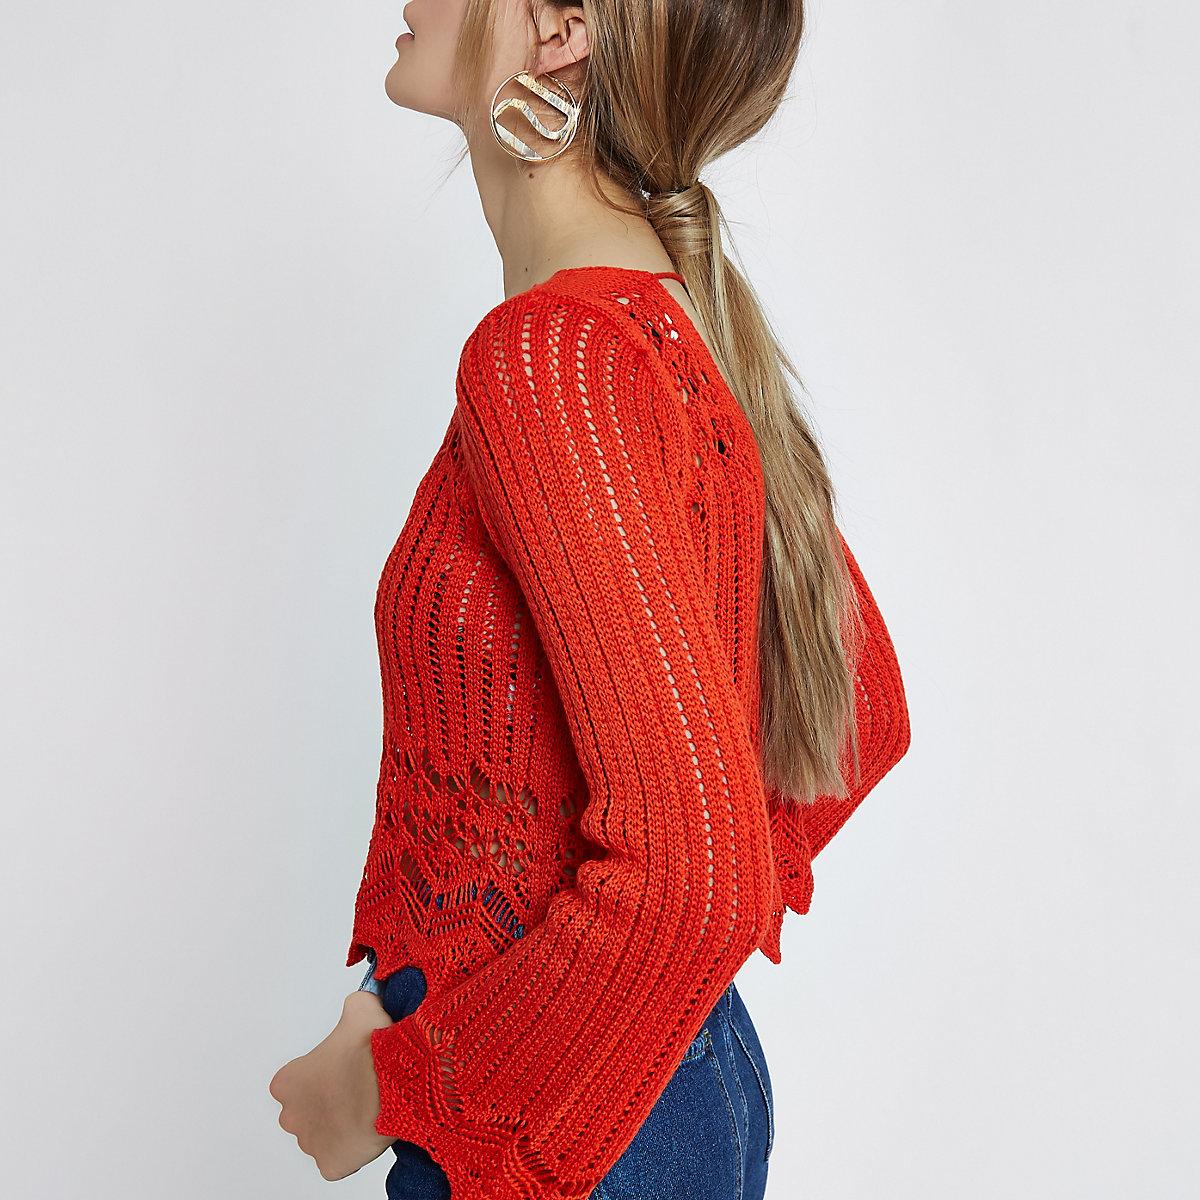 Red crotchet knit tassel crop top